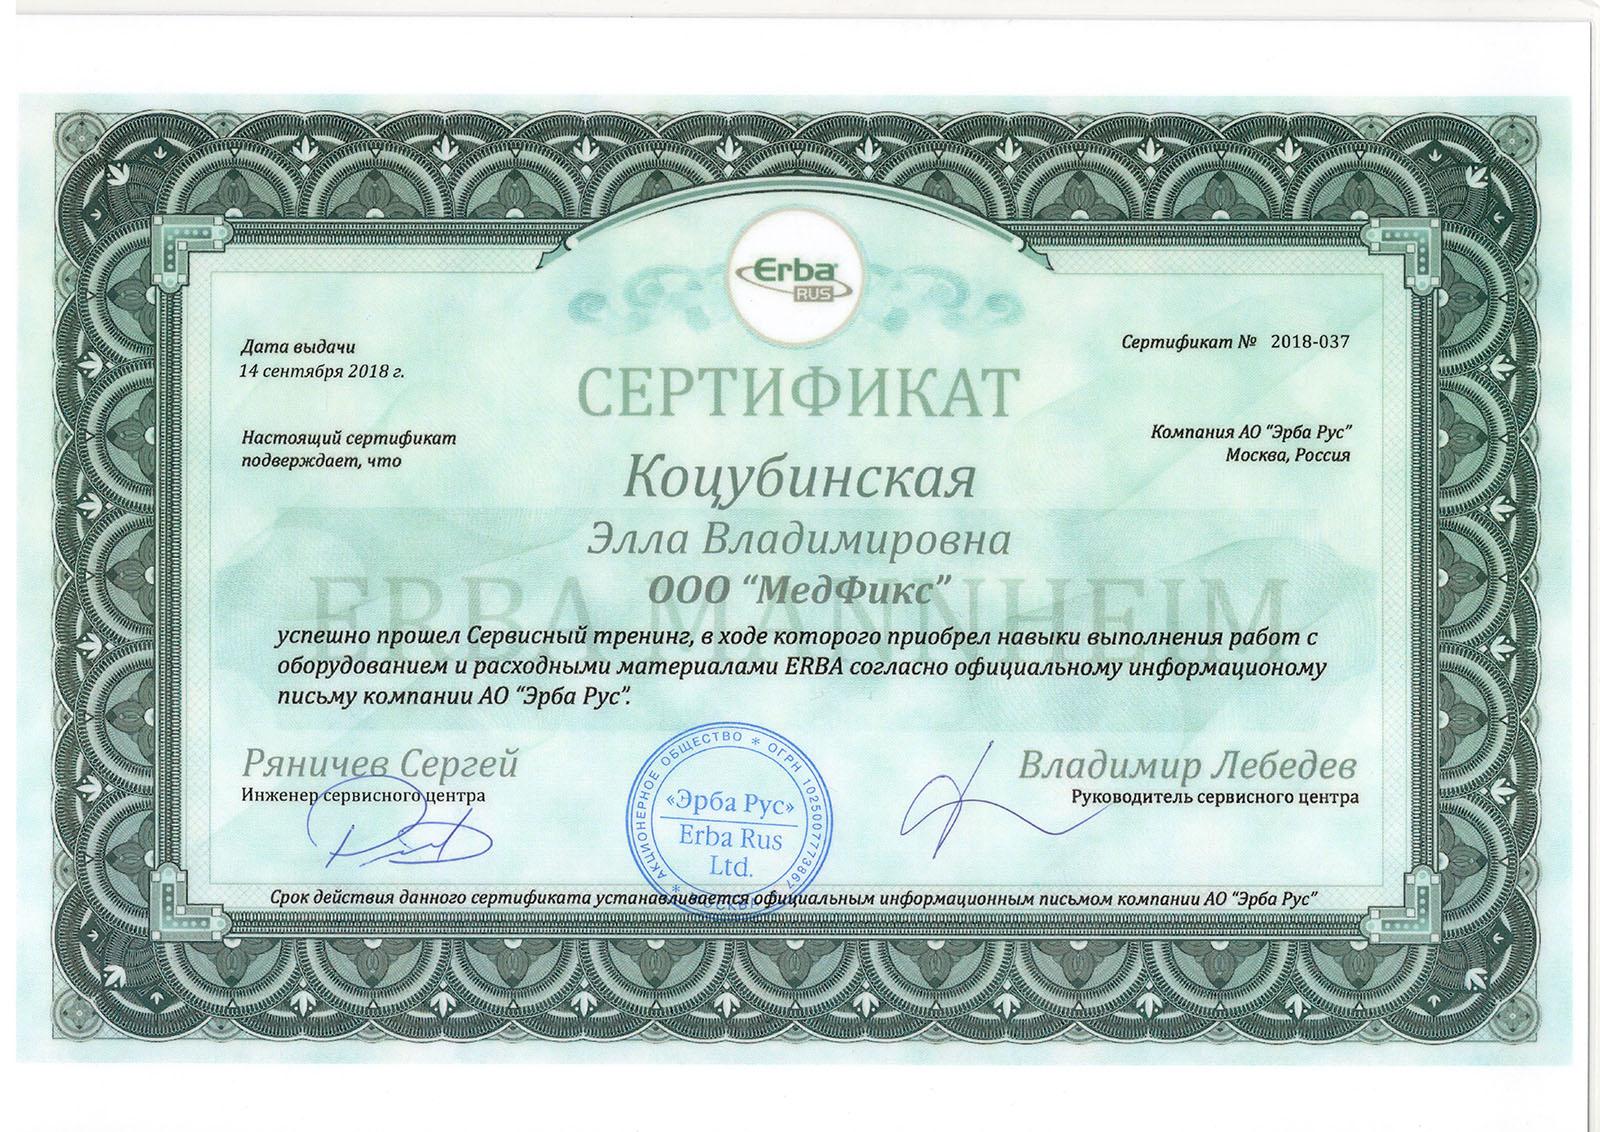 laboratornoe-oborudovanie - Erba-Kotsubinskaya-14.09.2019